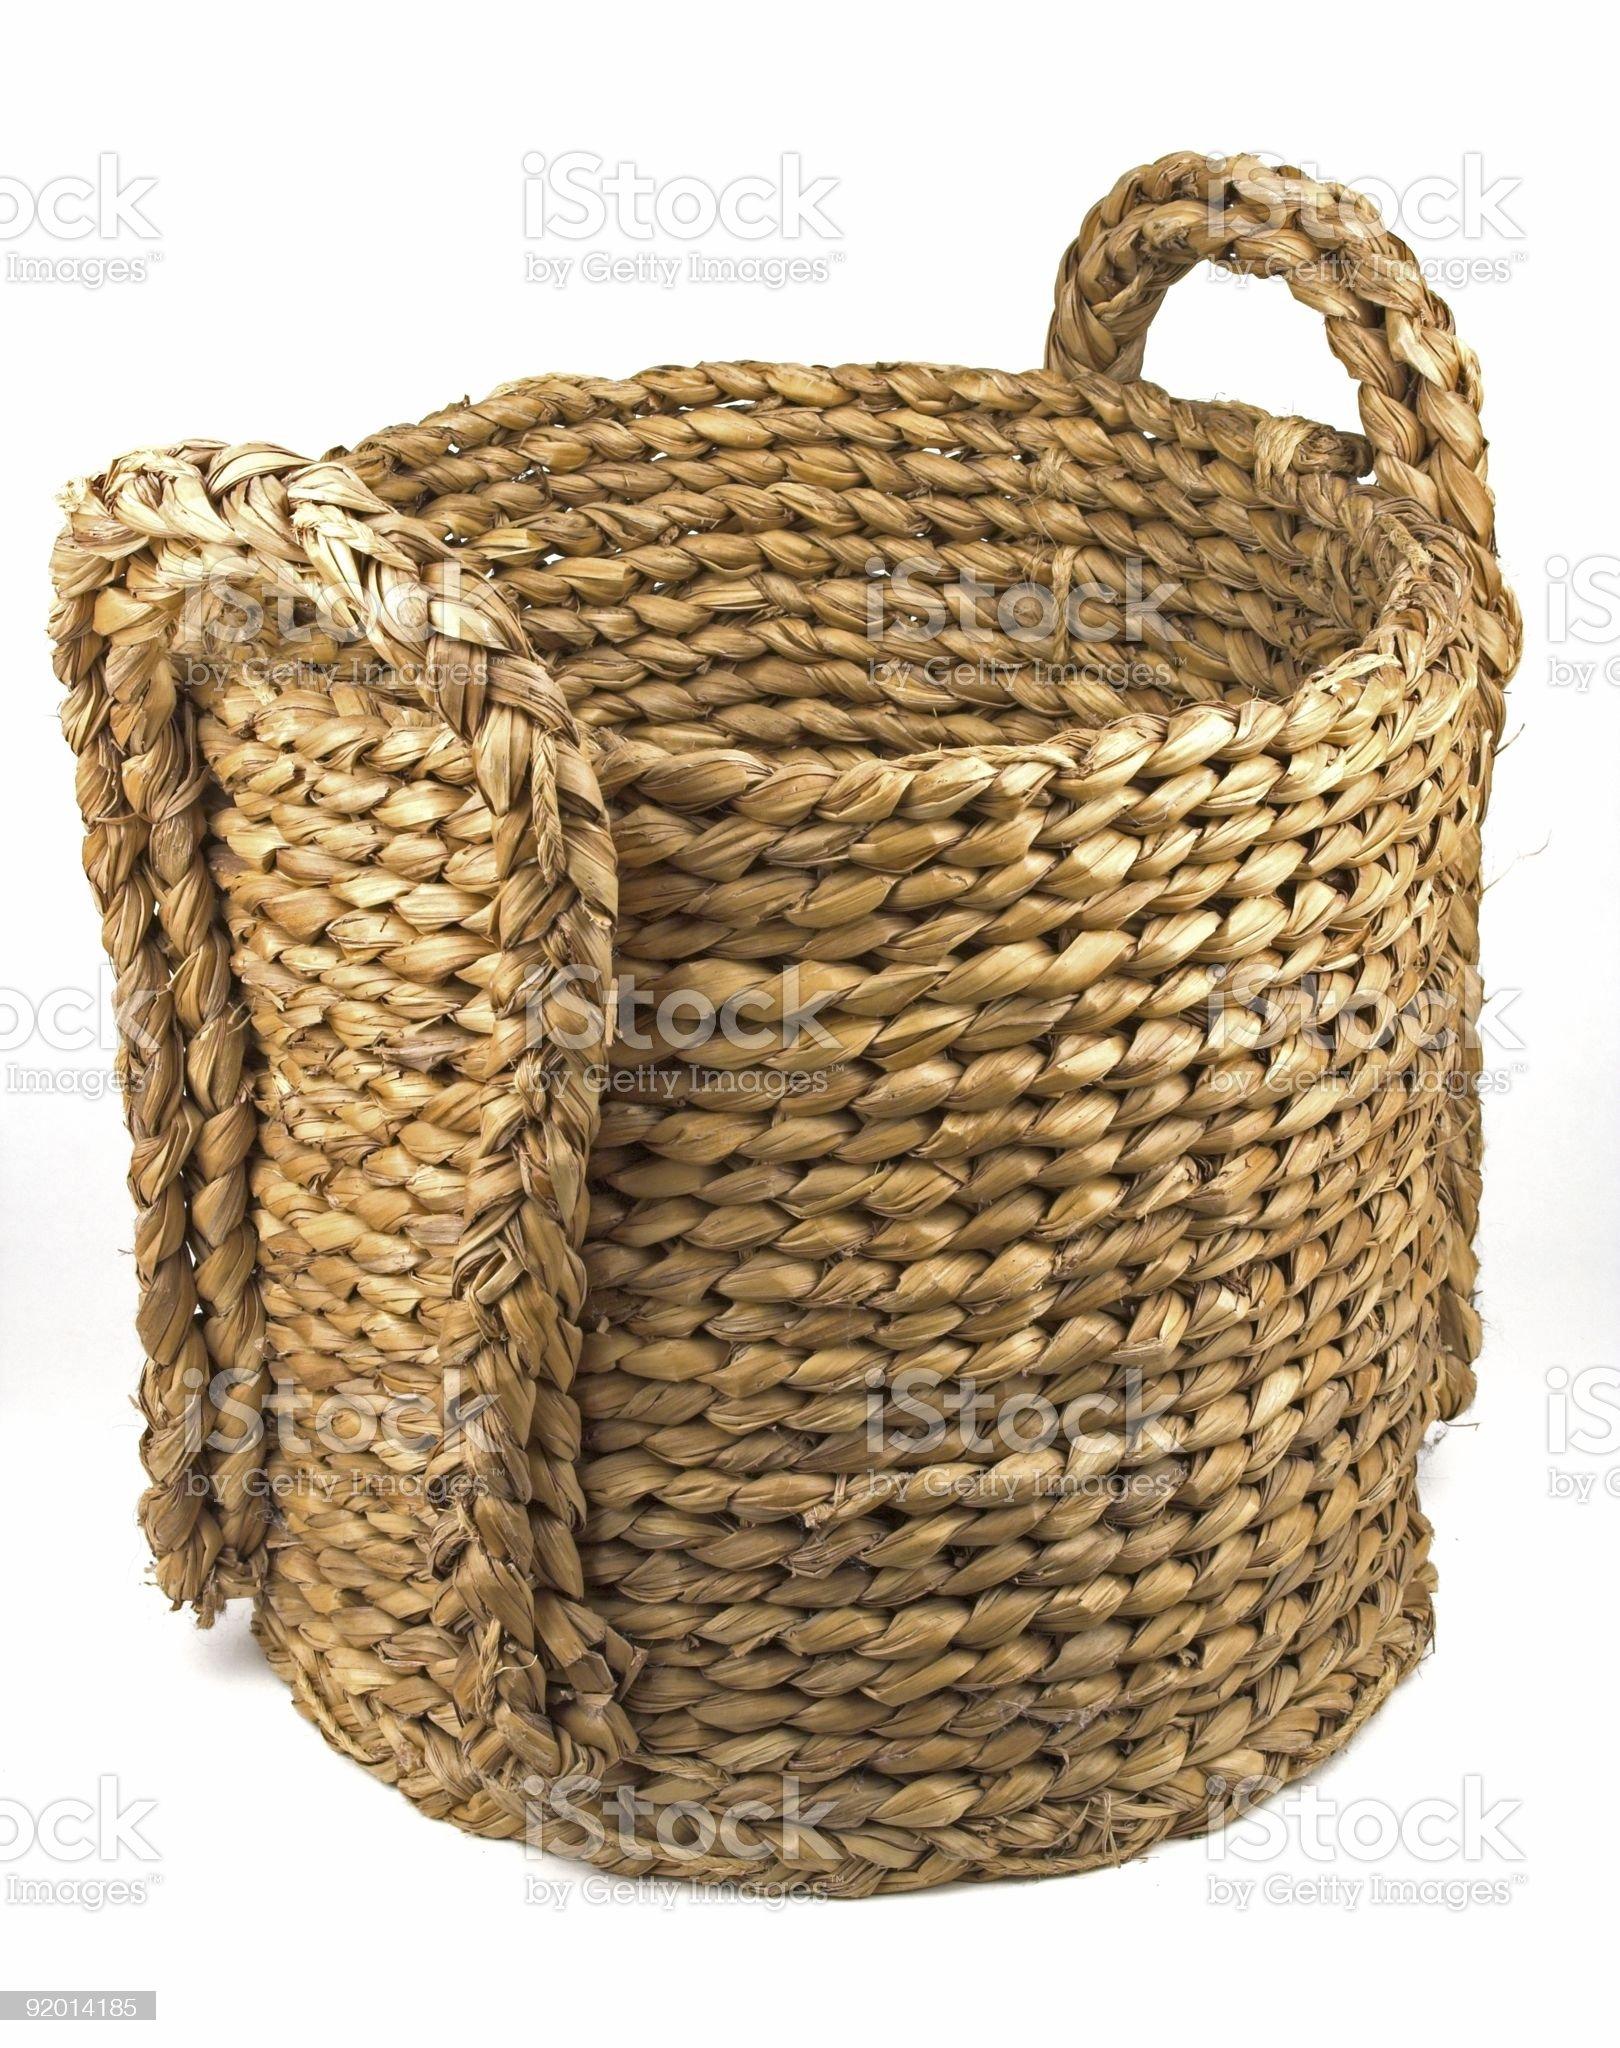 Straw Basket royalty-free stock photo